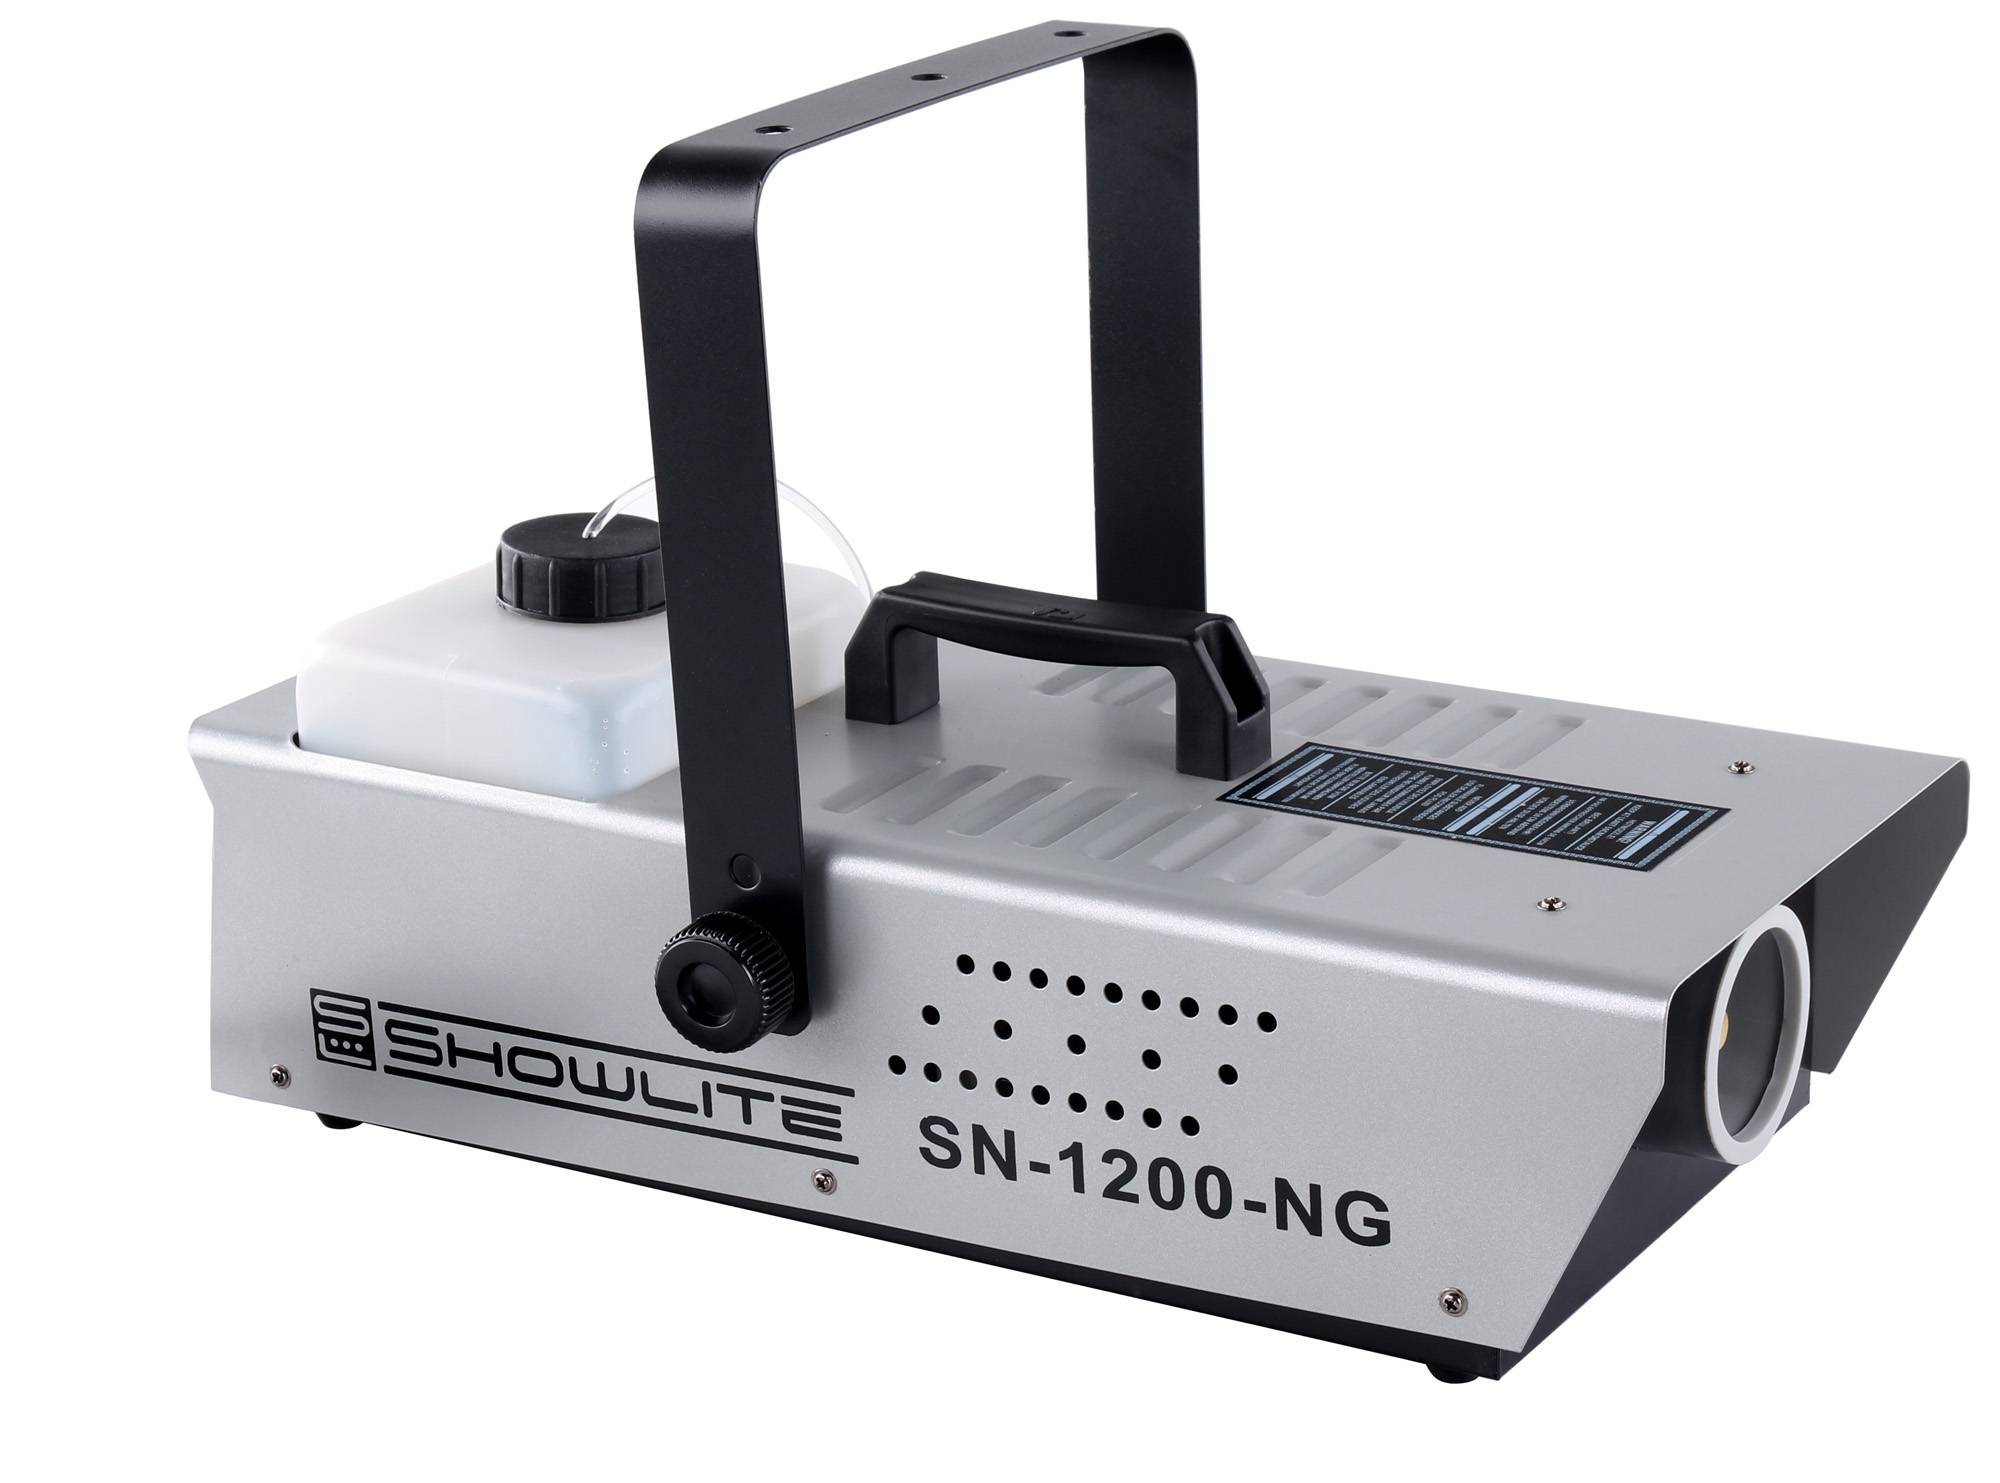 Complete set Showlite SN-1200 Fog machine + 5 L smoke fluid